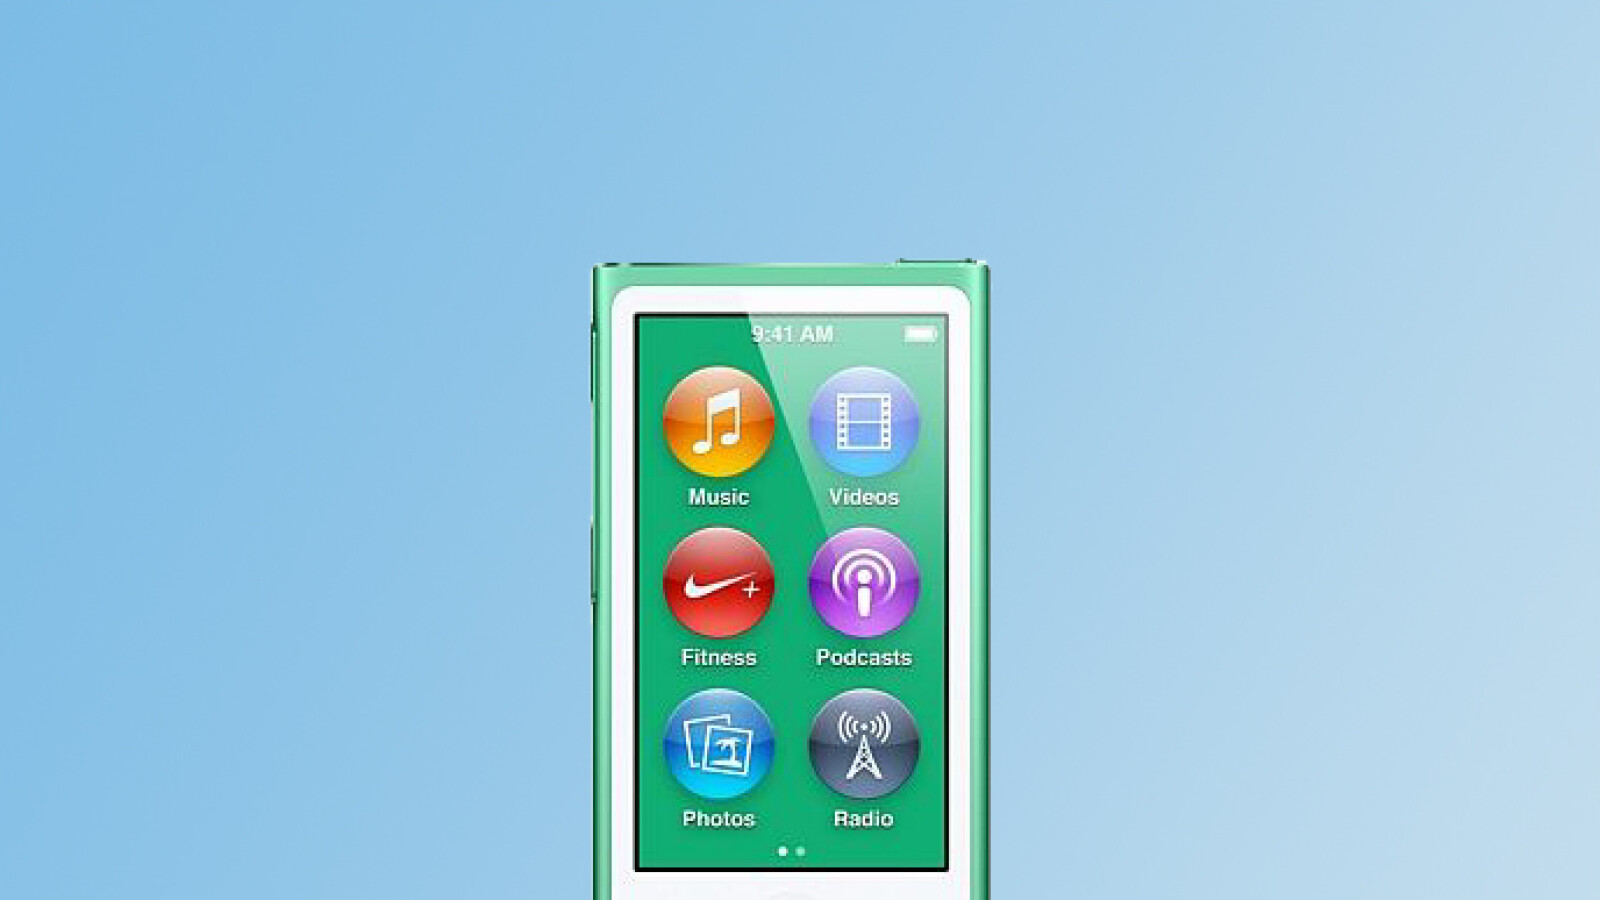 touchdownsizing apple ipod nano 7g im test netzwelt. Black Bedroom Furniture Sets. Home Design Ideas